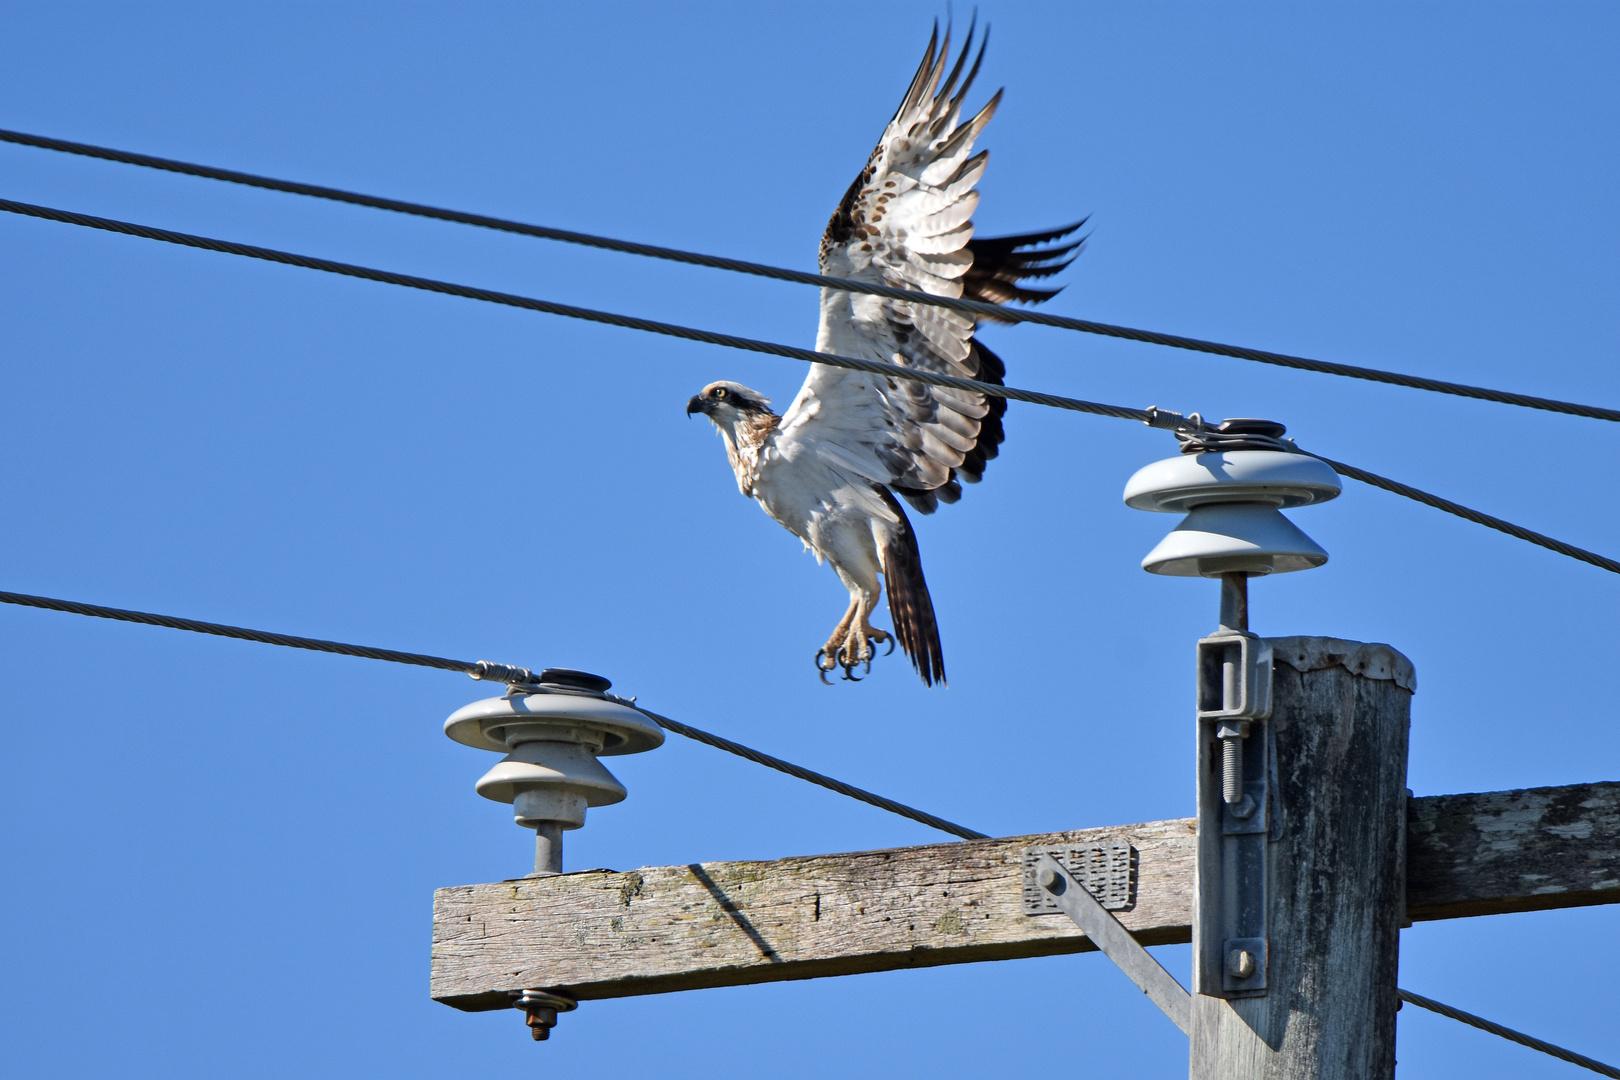 Eastern Osprey (Pandion cristatus), (2/3)